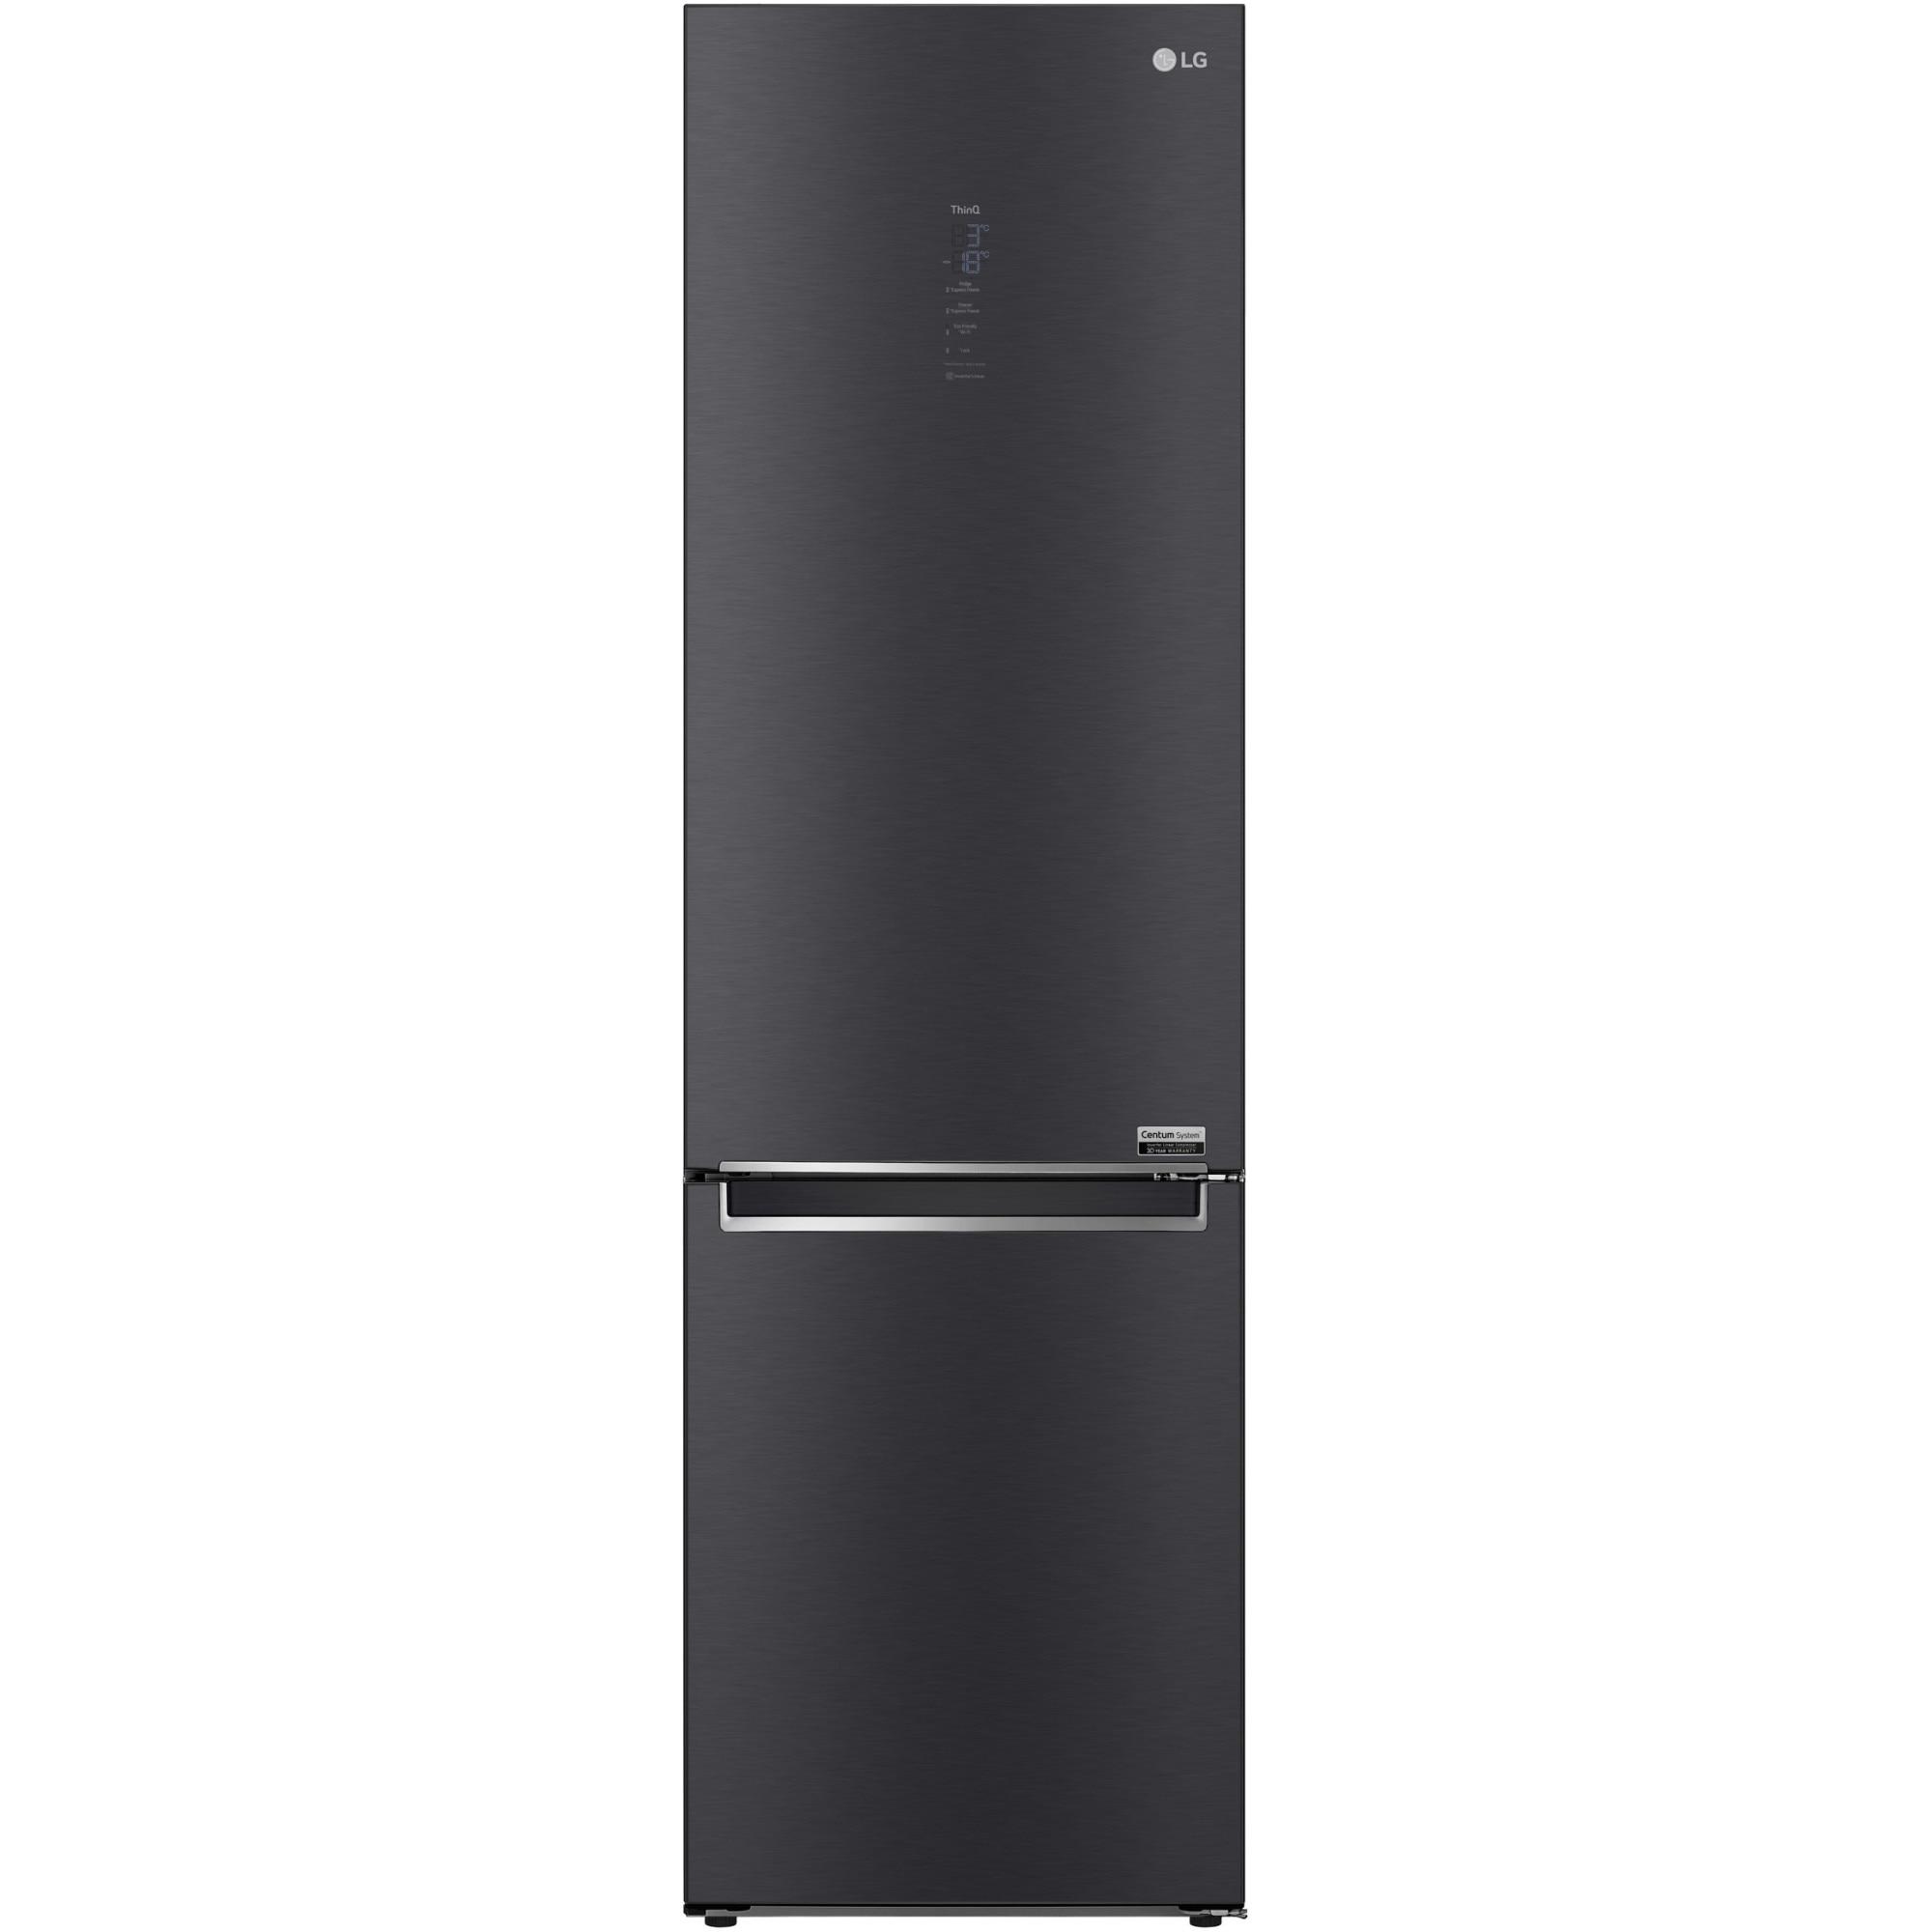 Fotografie Combina frigorifica LG GBB92MCACP, 384 l, Clasa C, No Frost, Smart Diagnosis, Wi-Fi, H 203 cm, Negru